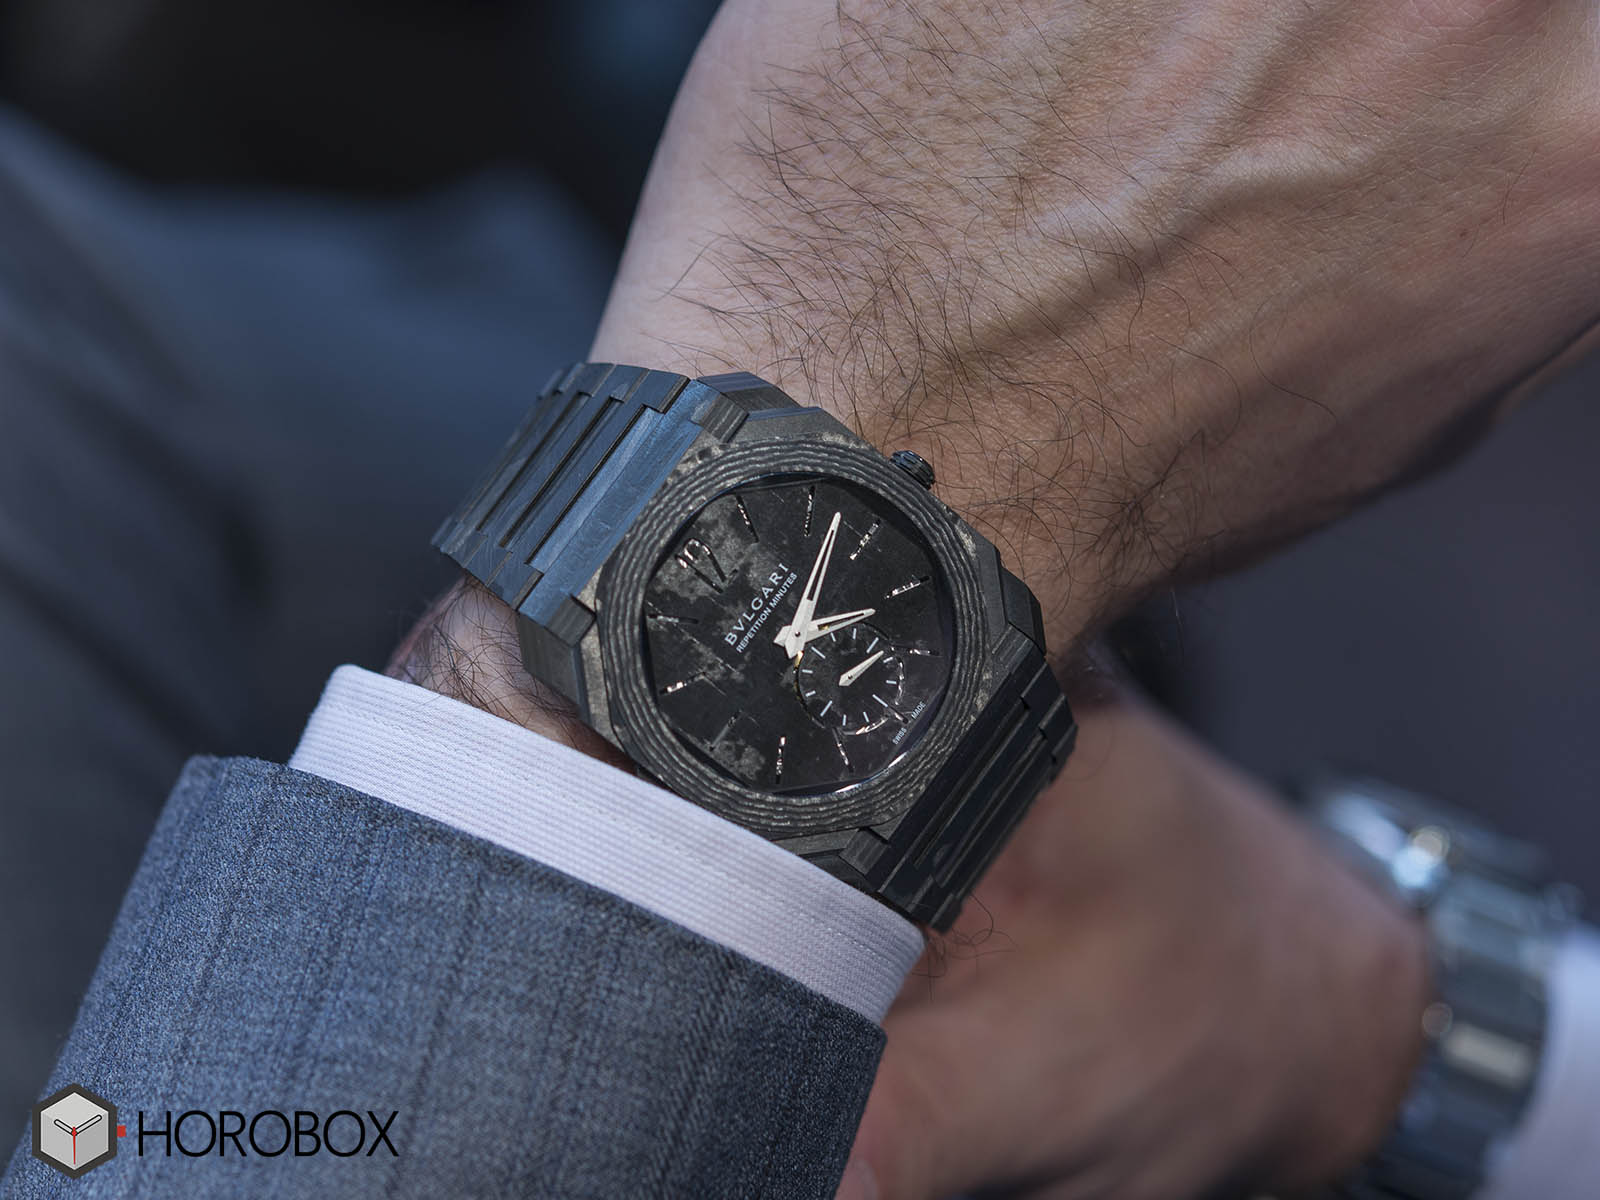 bulgari-octo-finissimo-minute-repeater-carbon-2.jpg